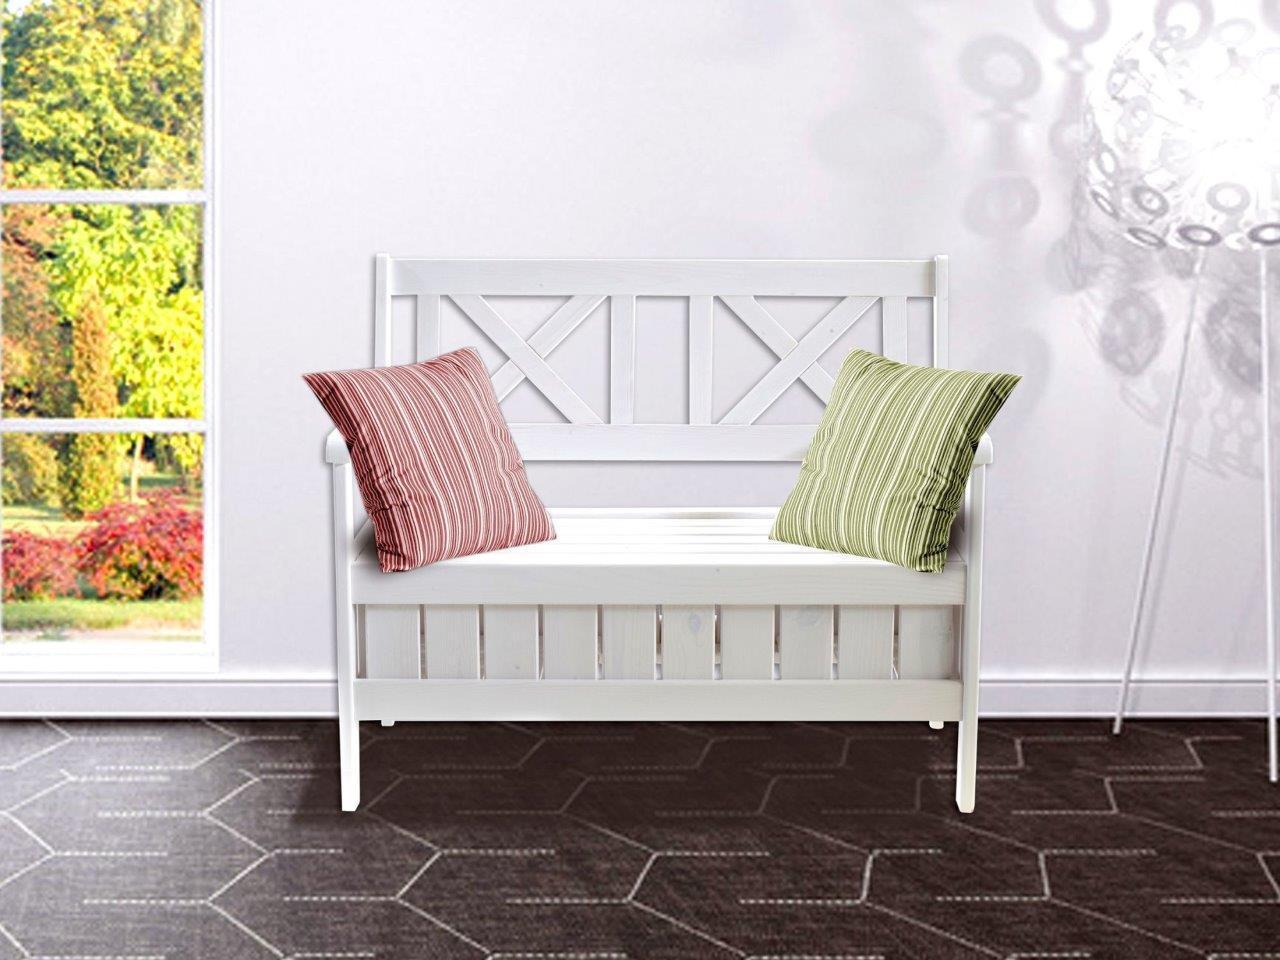 truhenbank sitzbank k chenbank holzbank landhaus shabby chic wei kaufen bei trendy home 24 gmbh. Black Bedroom Furniture Sets. Home Design Ideas